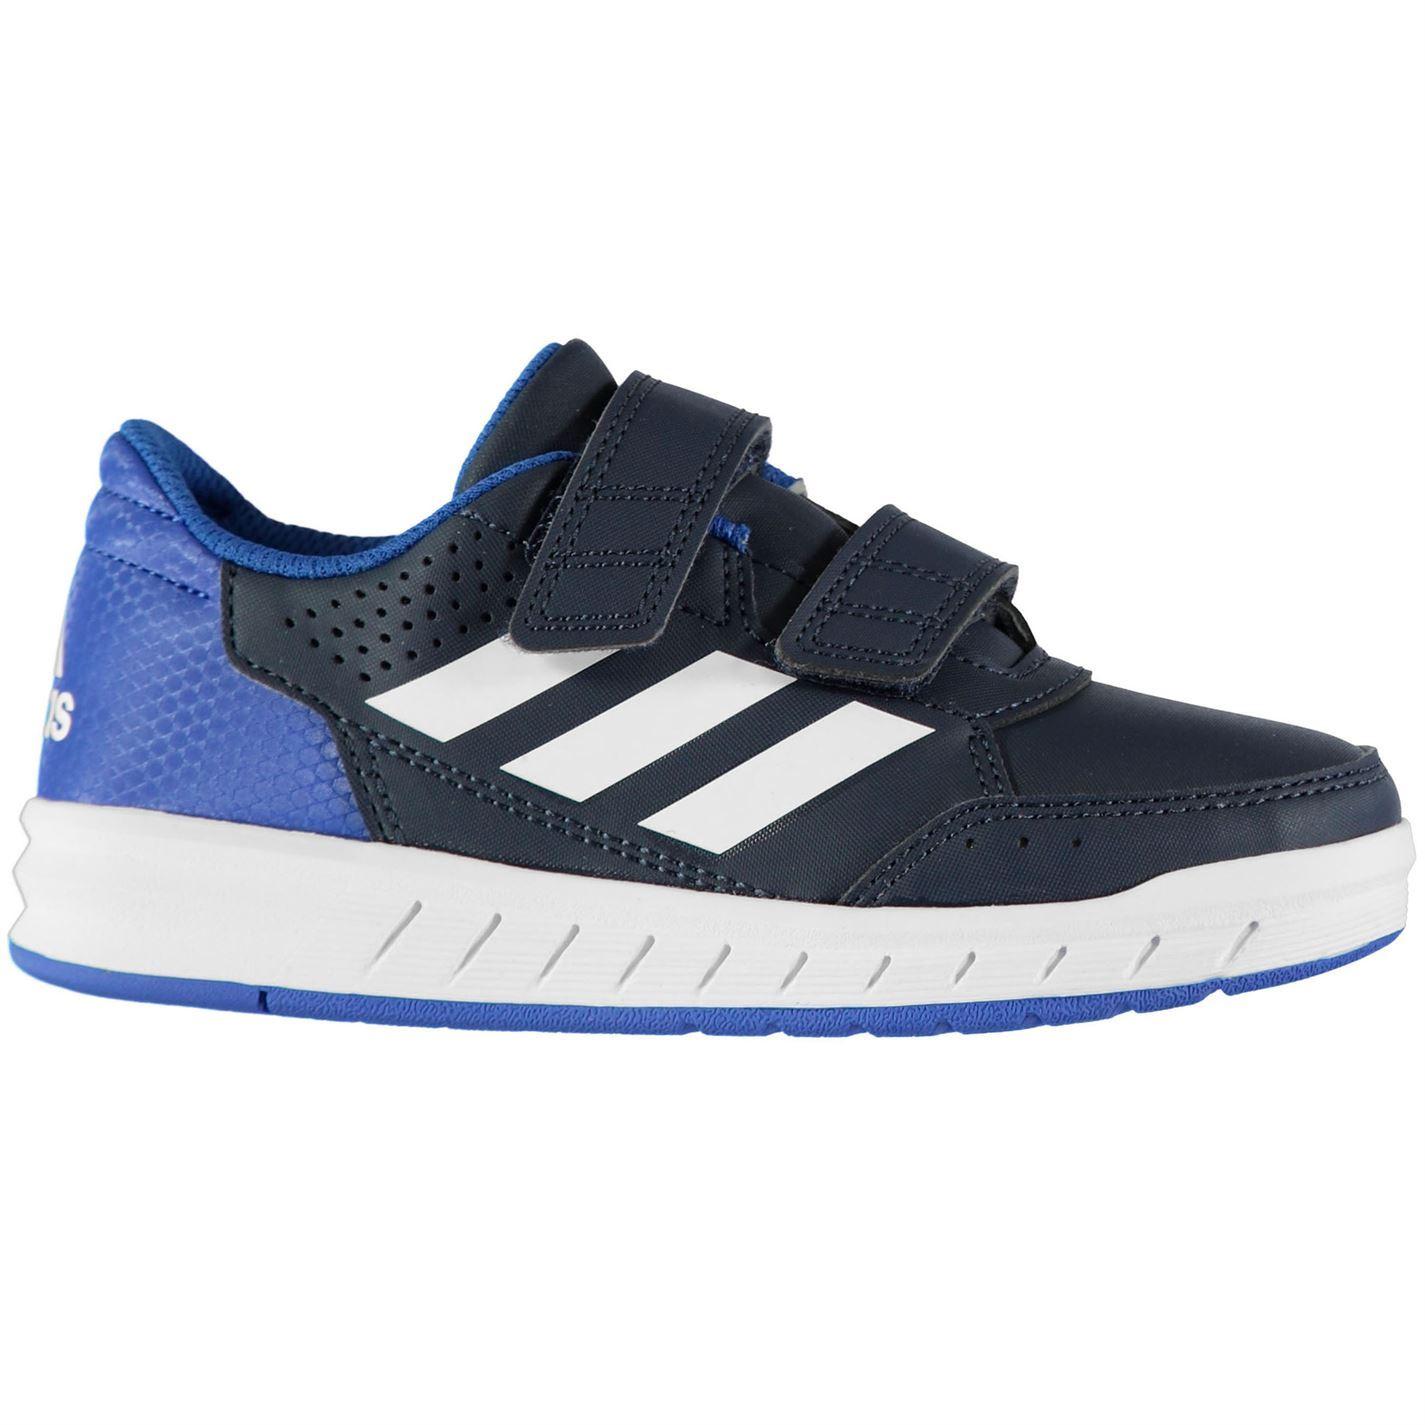 miniatura 9 - ADIDAS-alta-Sport-CF-Scarpe-da-ginnastica-bambino-ragazzo-calzature